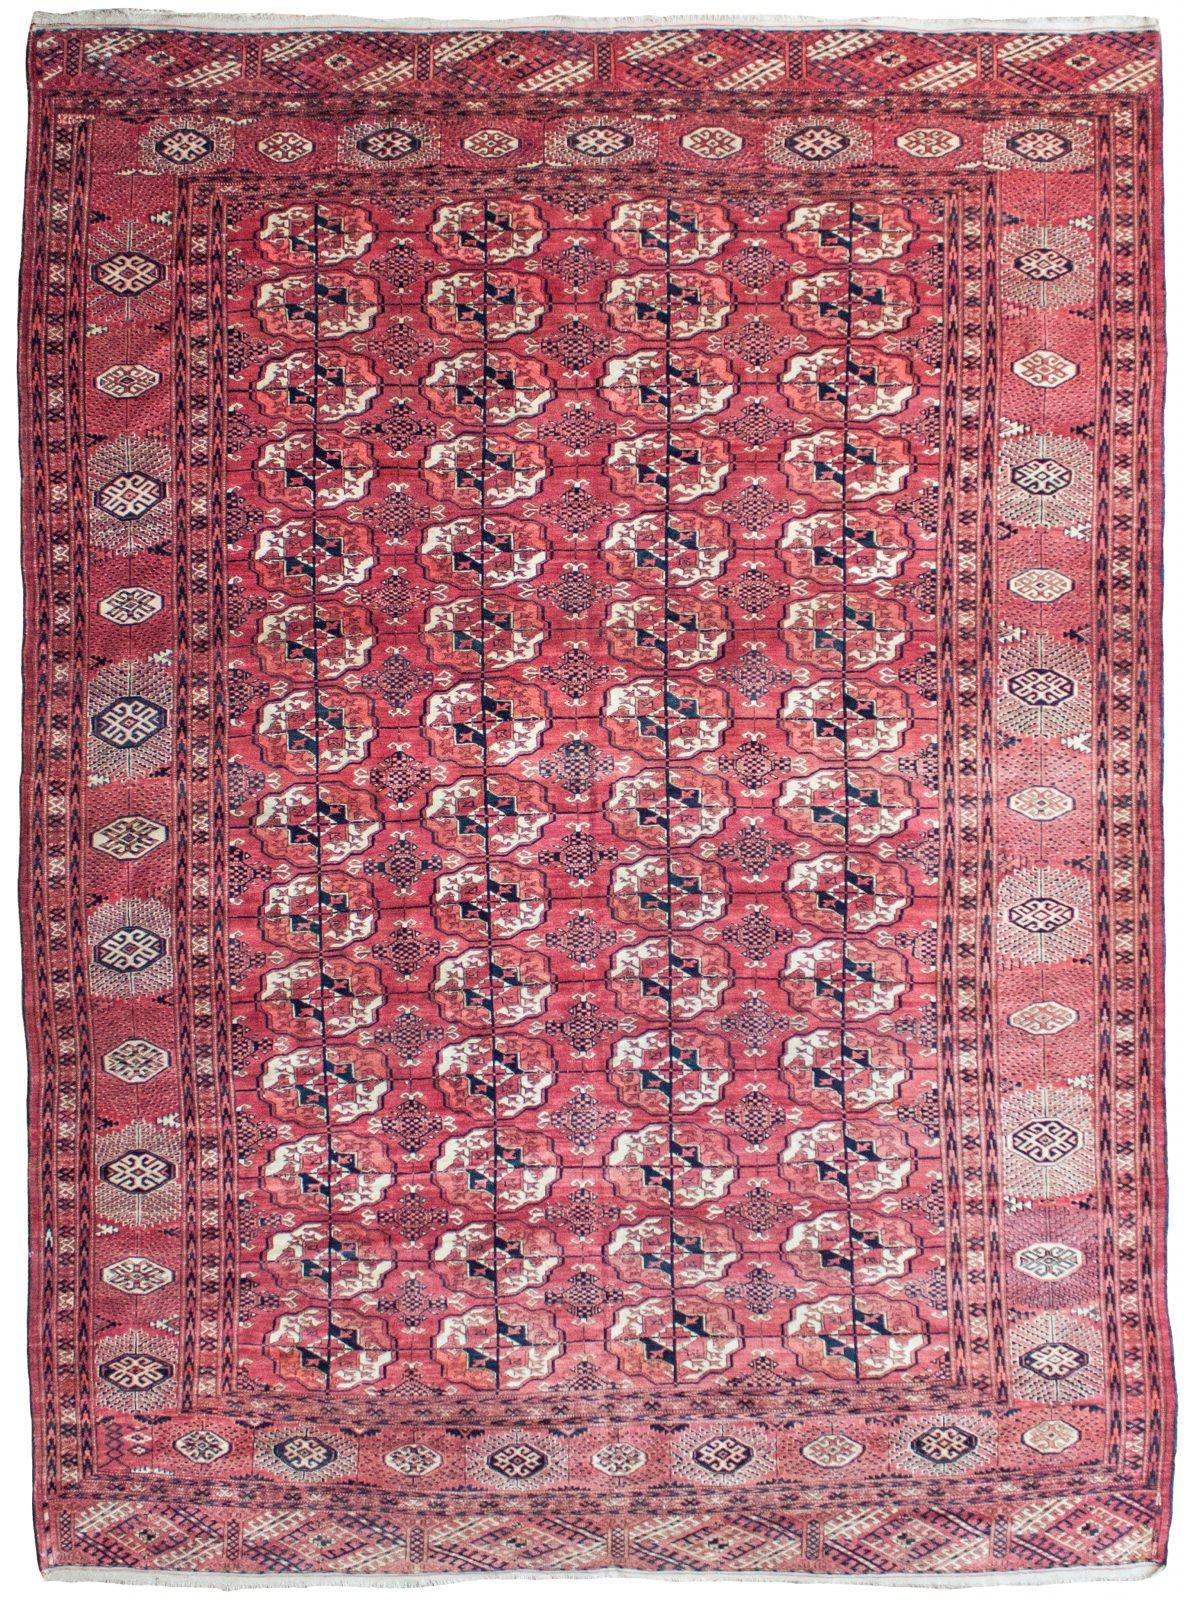 Antique Tekke Bokhara Carpet Farnham